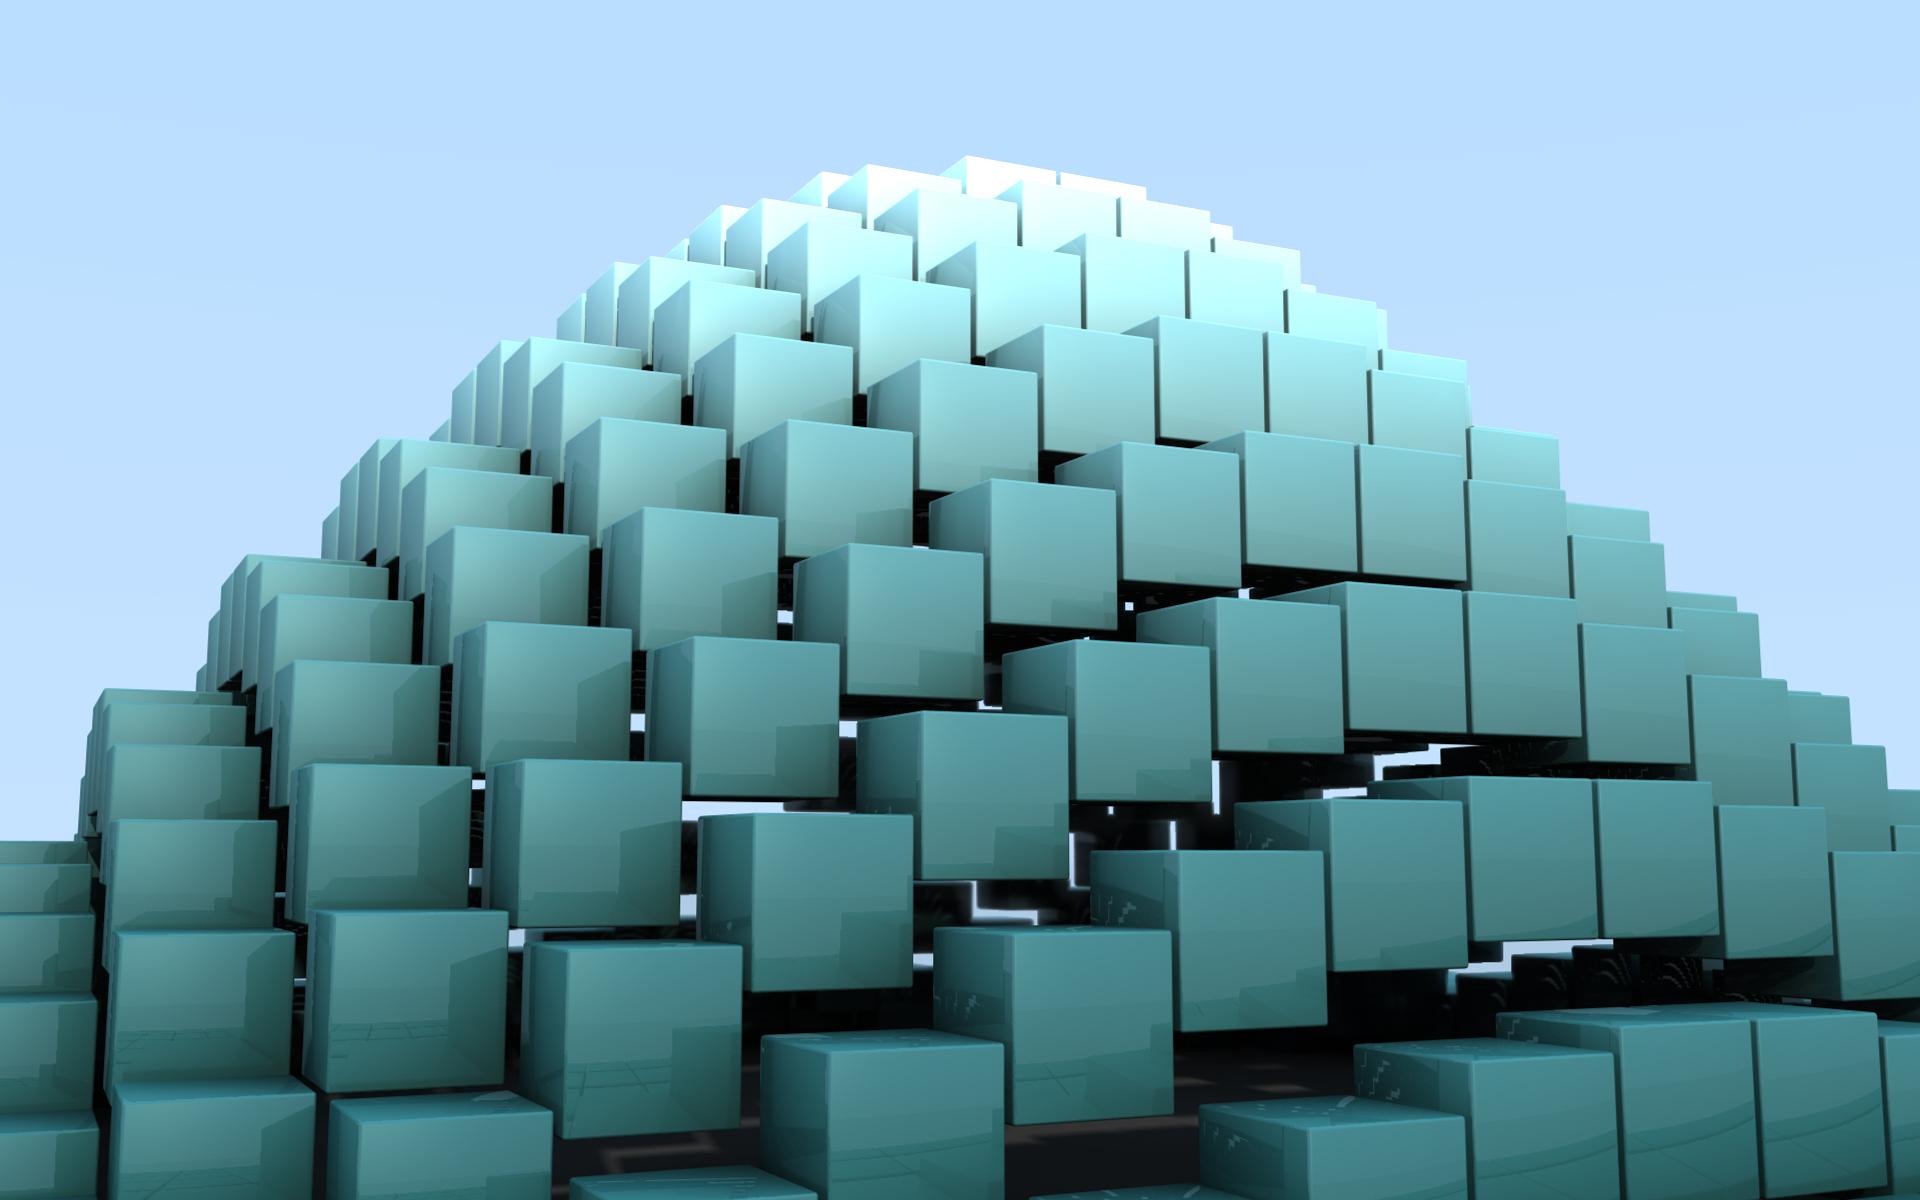 3D Cubes Wallpaper - WallpaperSafari